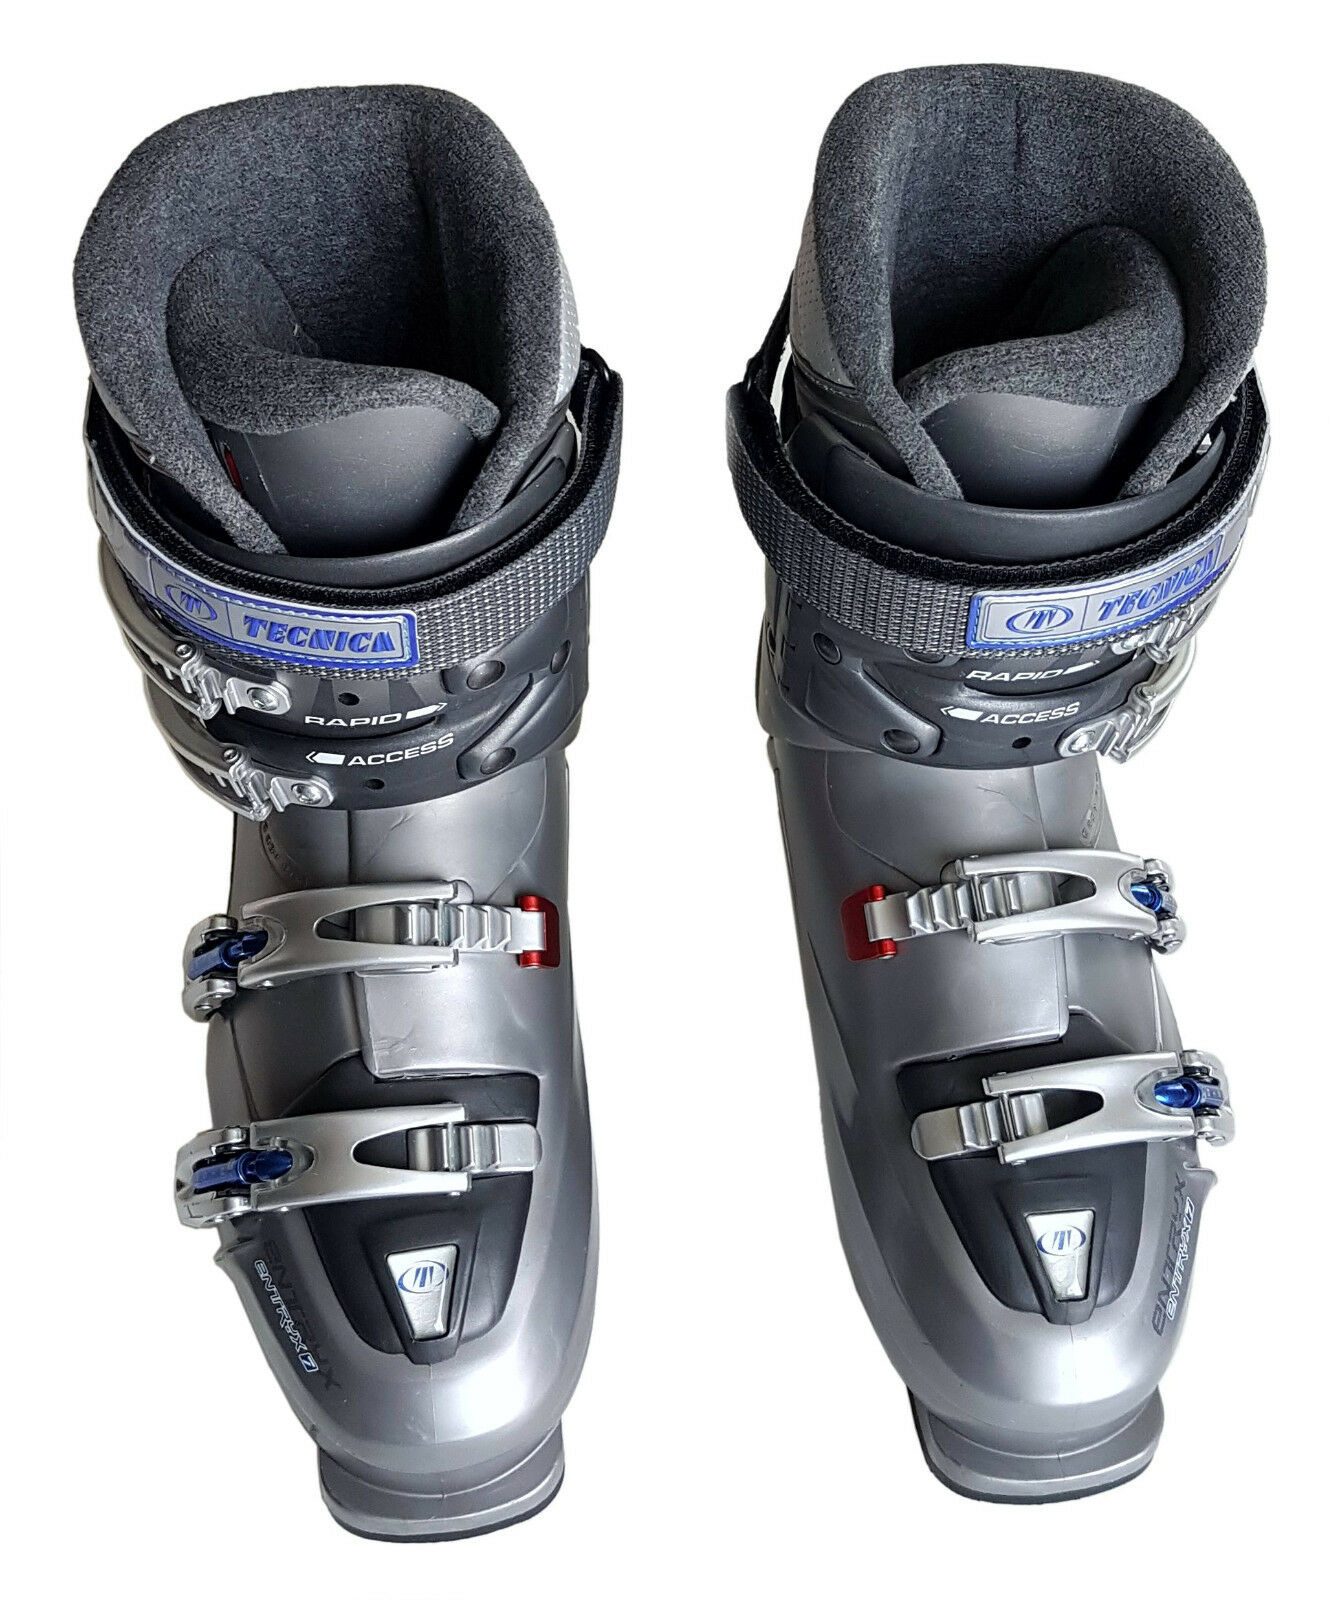 '05 Tecnica EntryX 7 Ladies Comfort Fit Ski Boot 10-10.5 27.0-27.5 Bright Steel